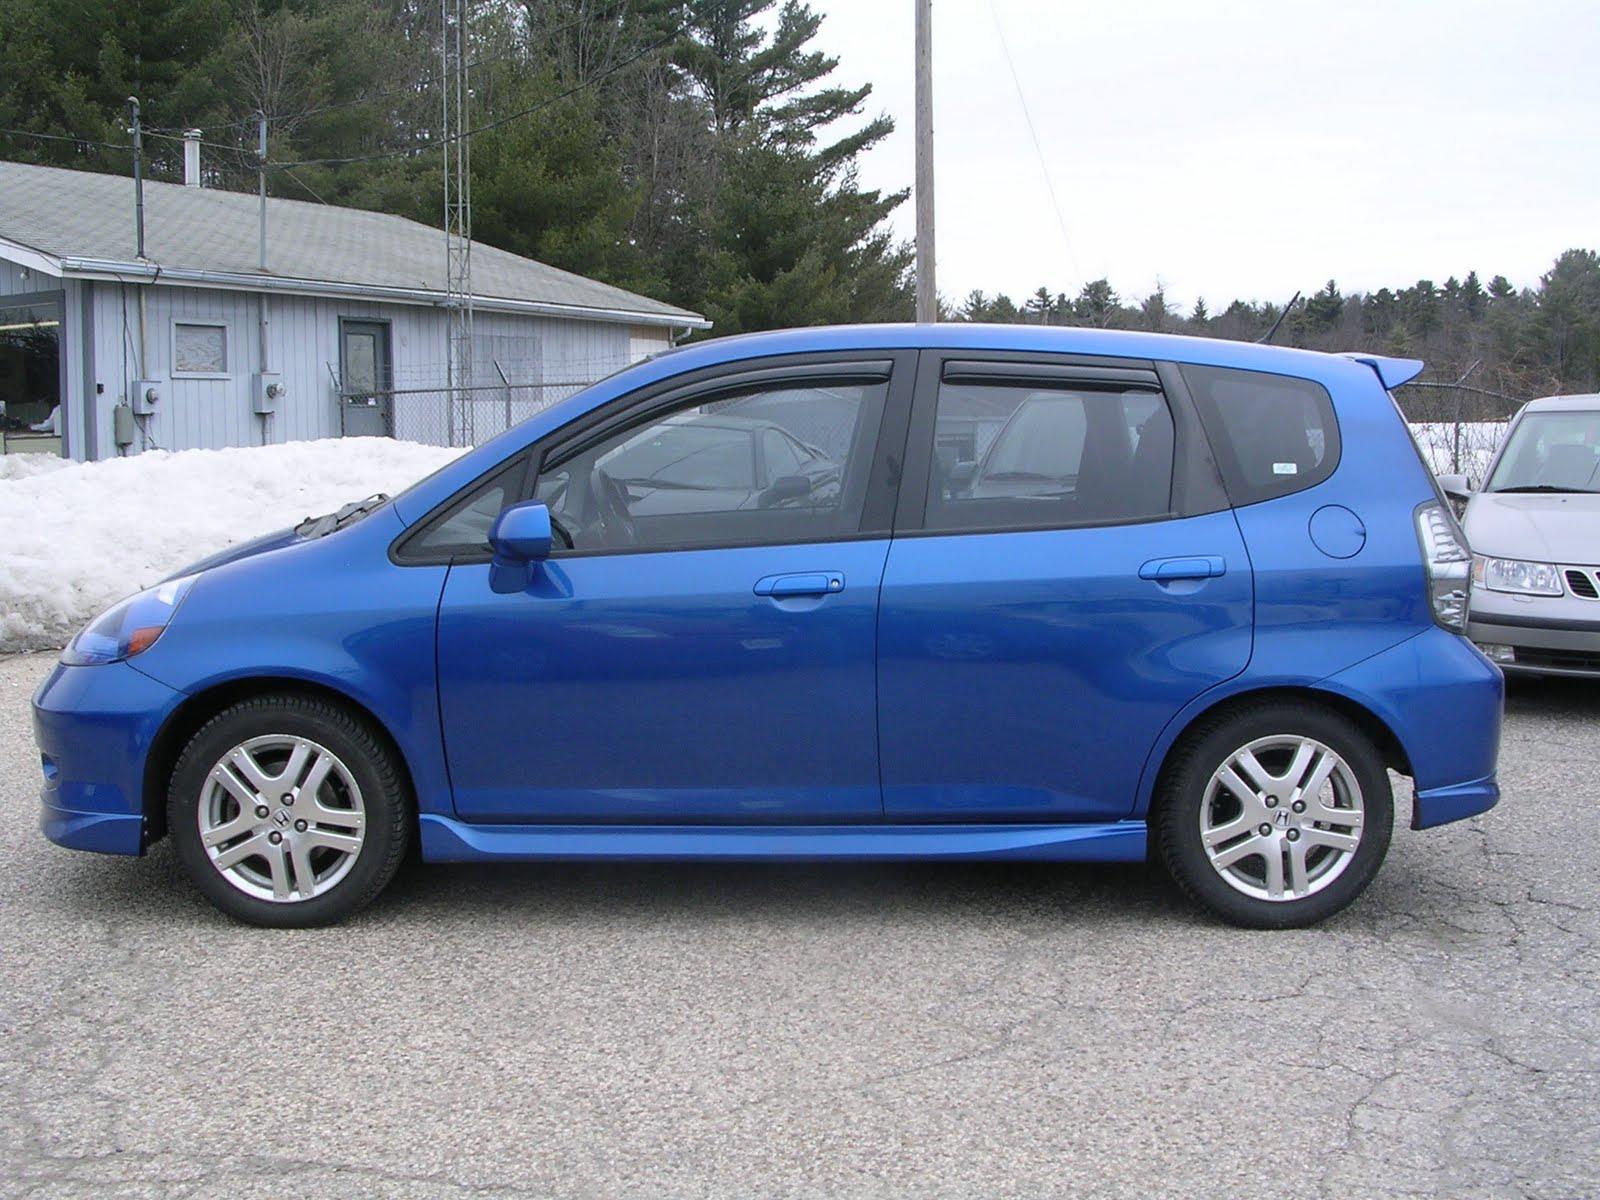 Earthy cars blog april 2011